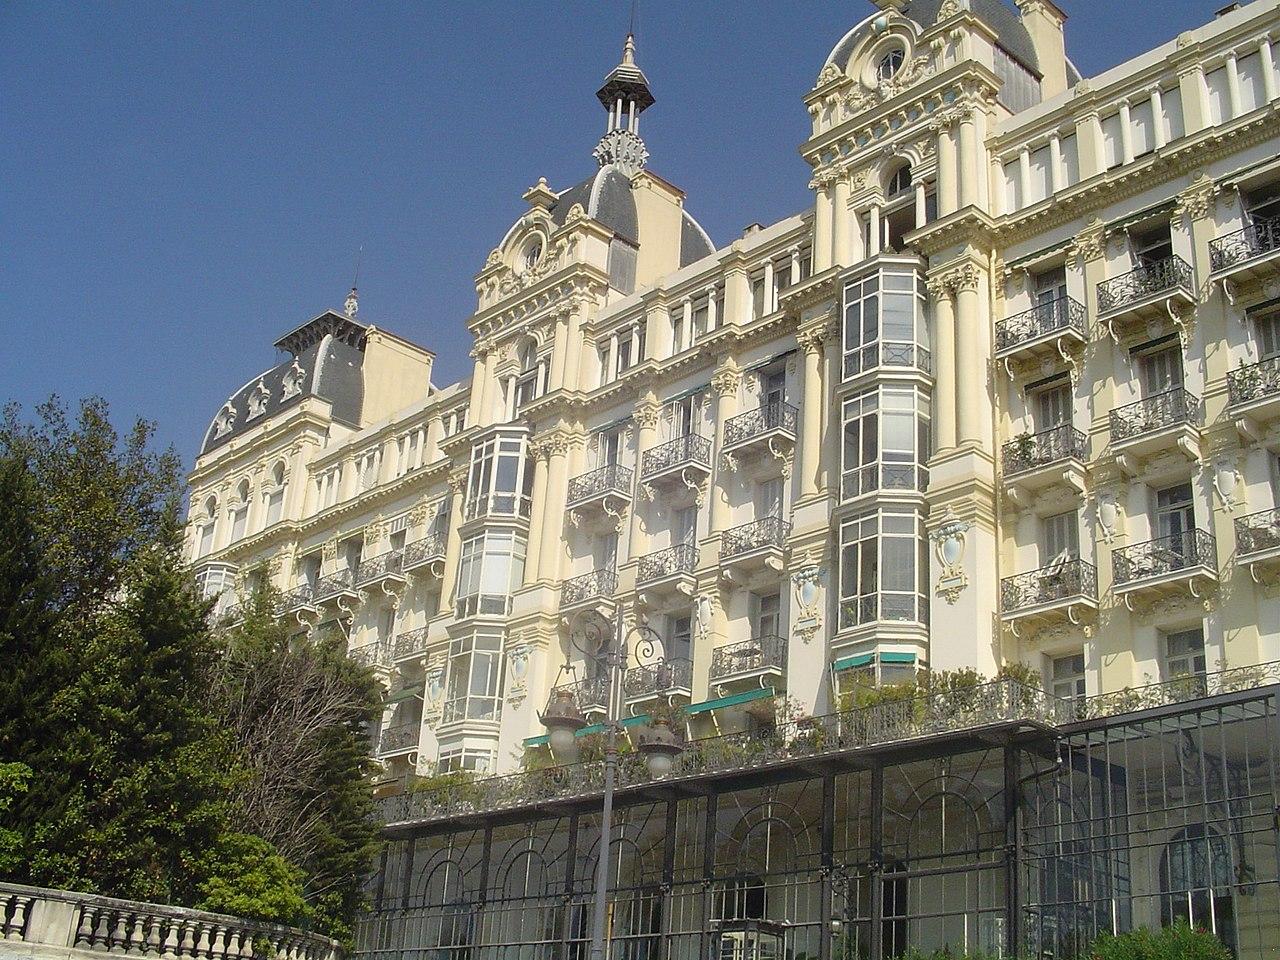 Hotel Excelsior Nice Tripadvisor